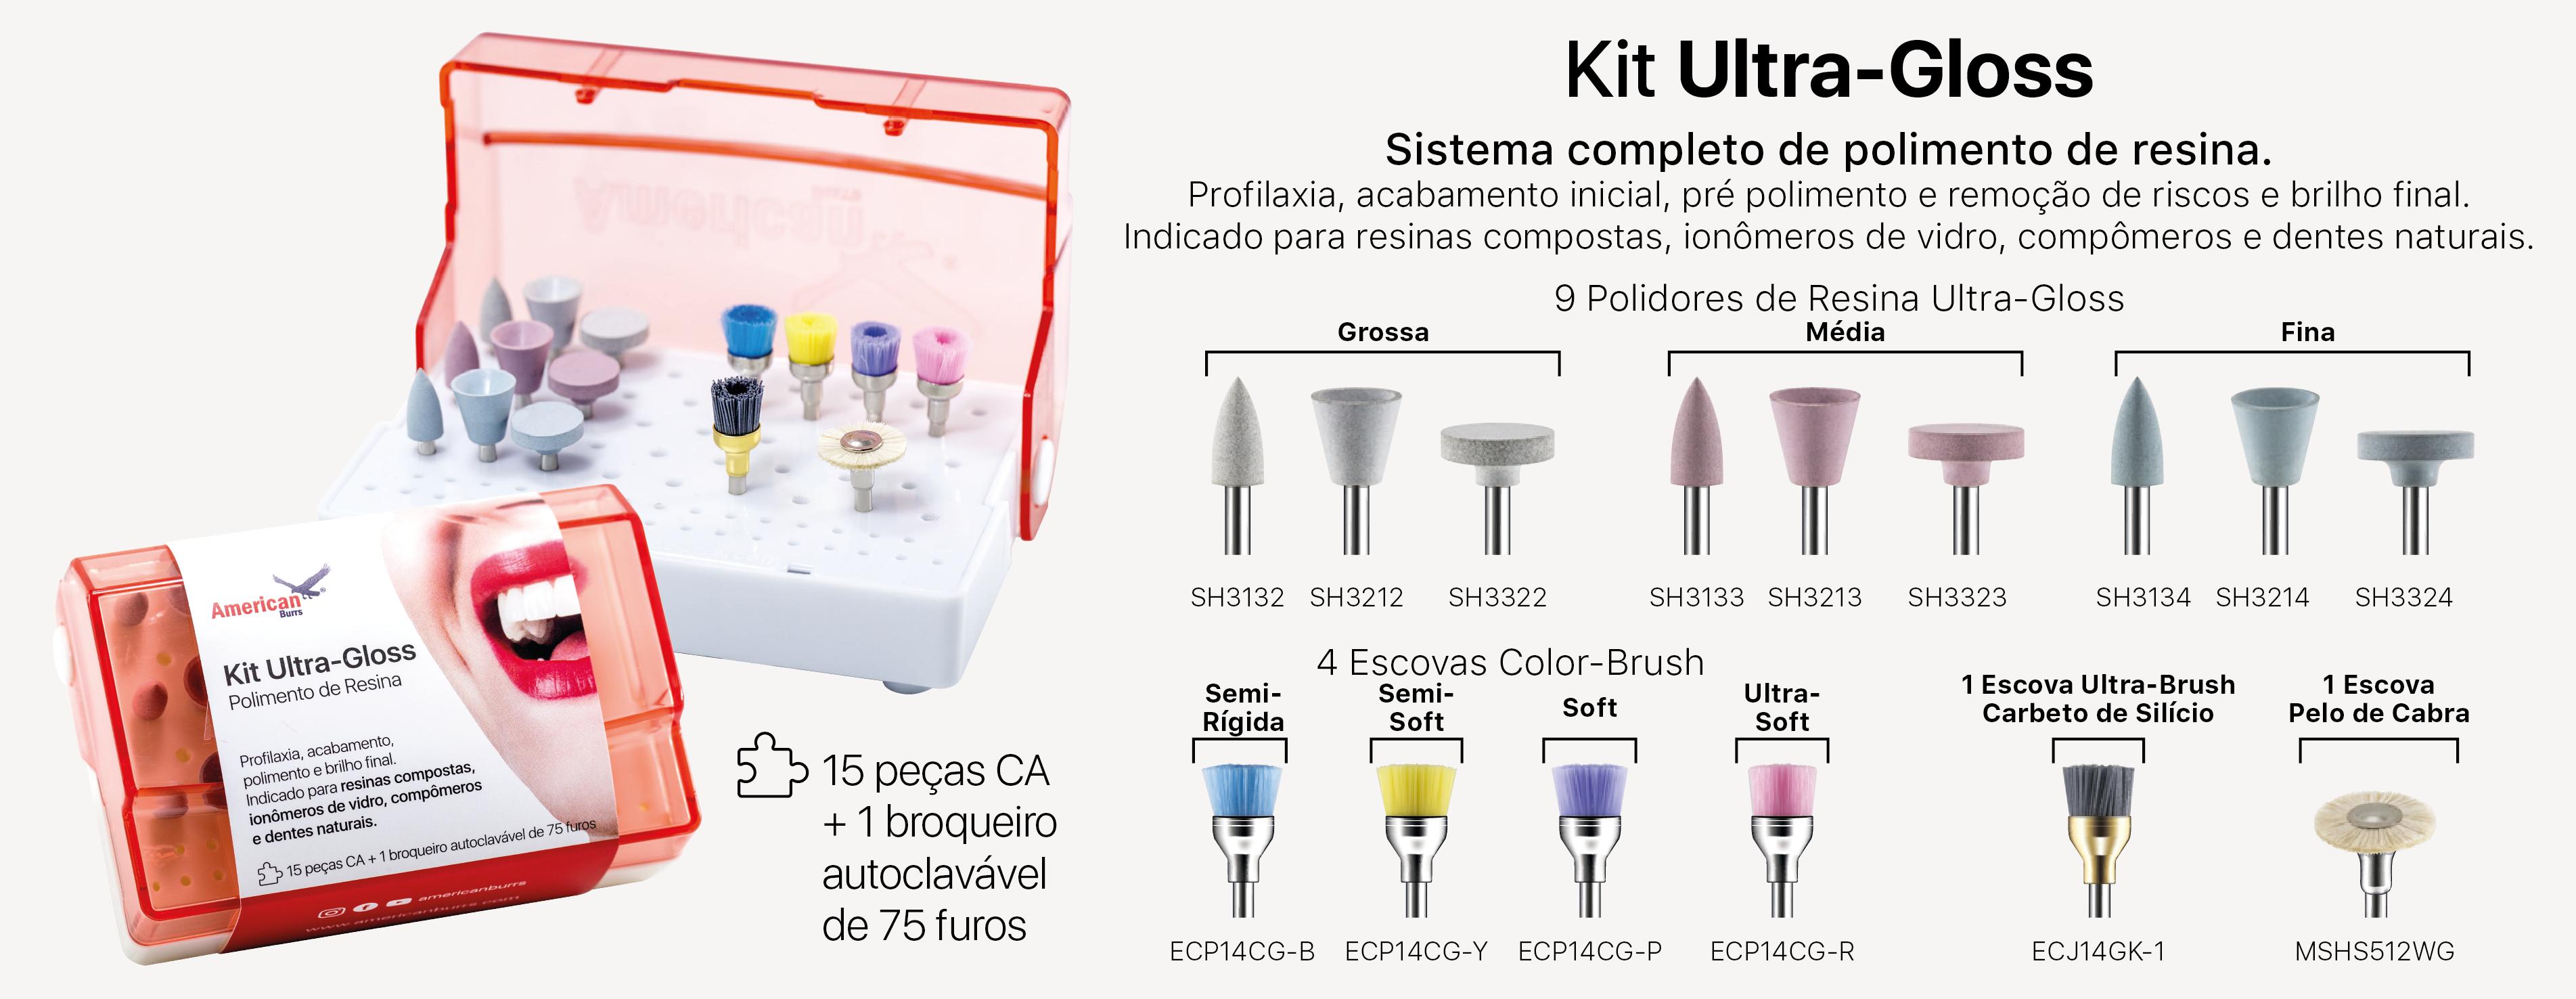 Infográfico do produto Kit p/ Polimento Resina Completo Ultra - Gloss